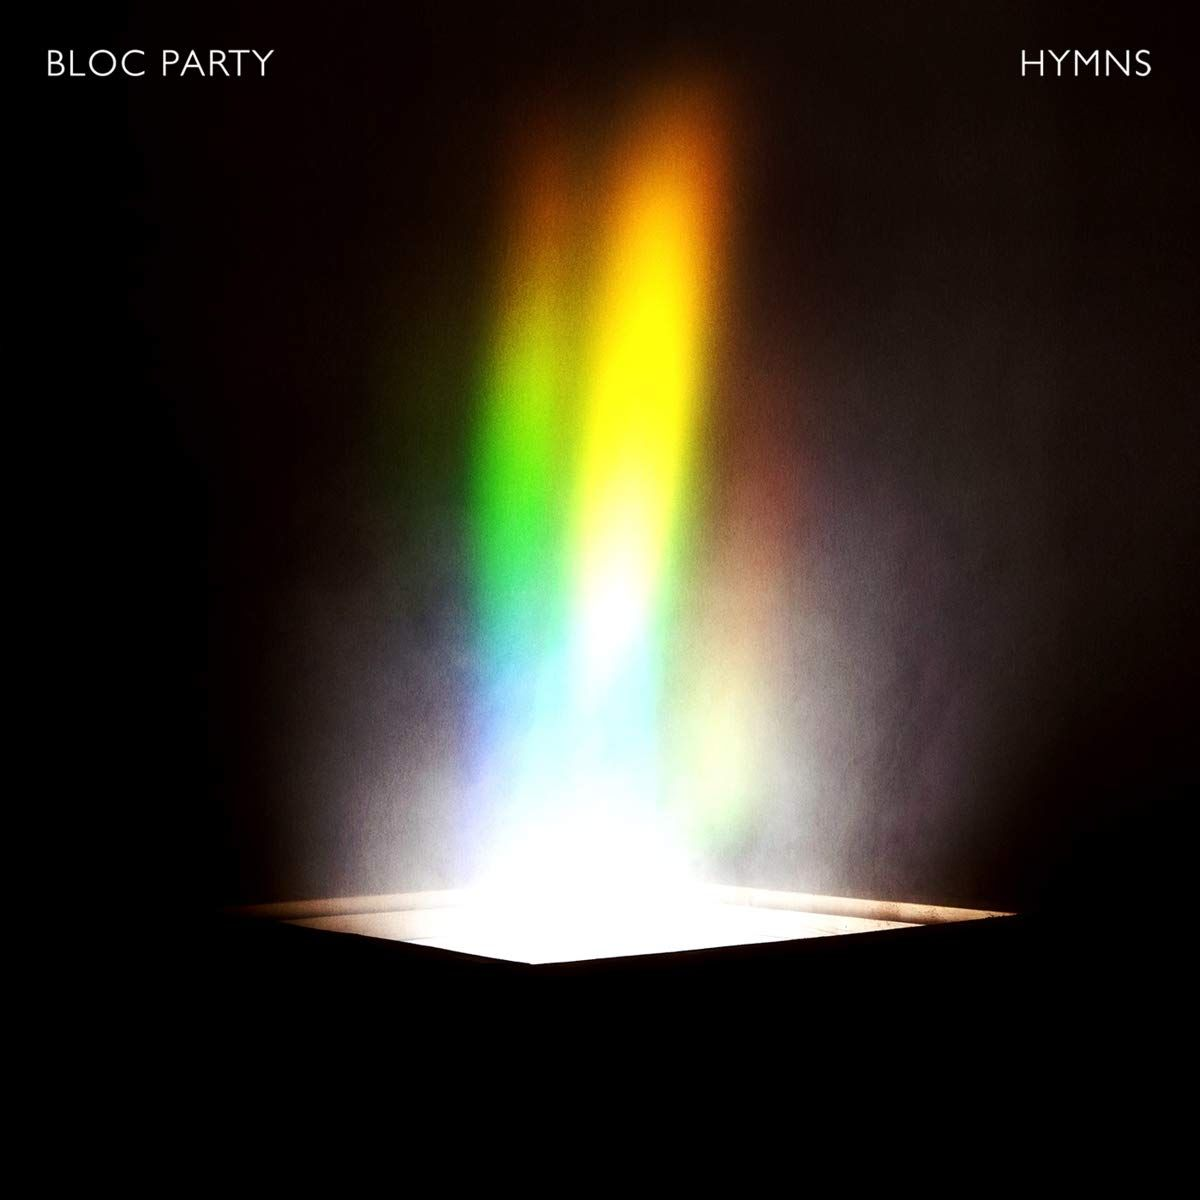 bloc-party-hymns-artwork.jpg